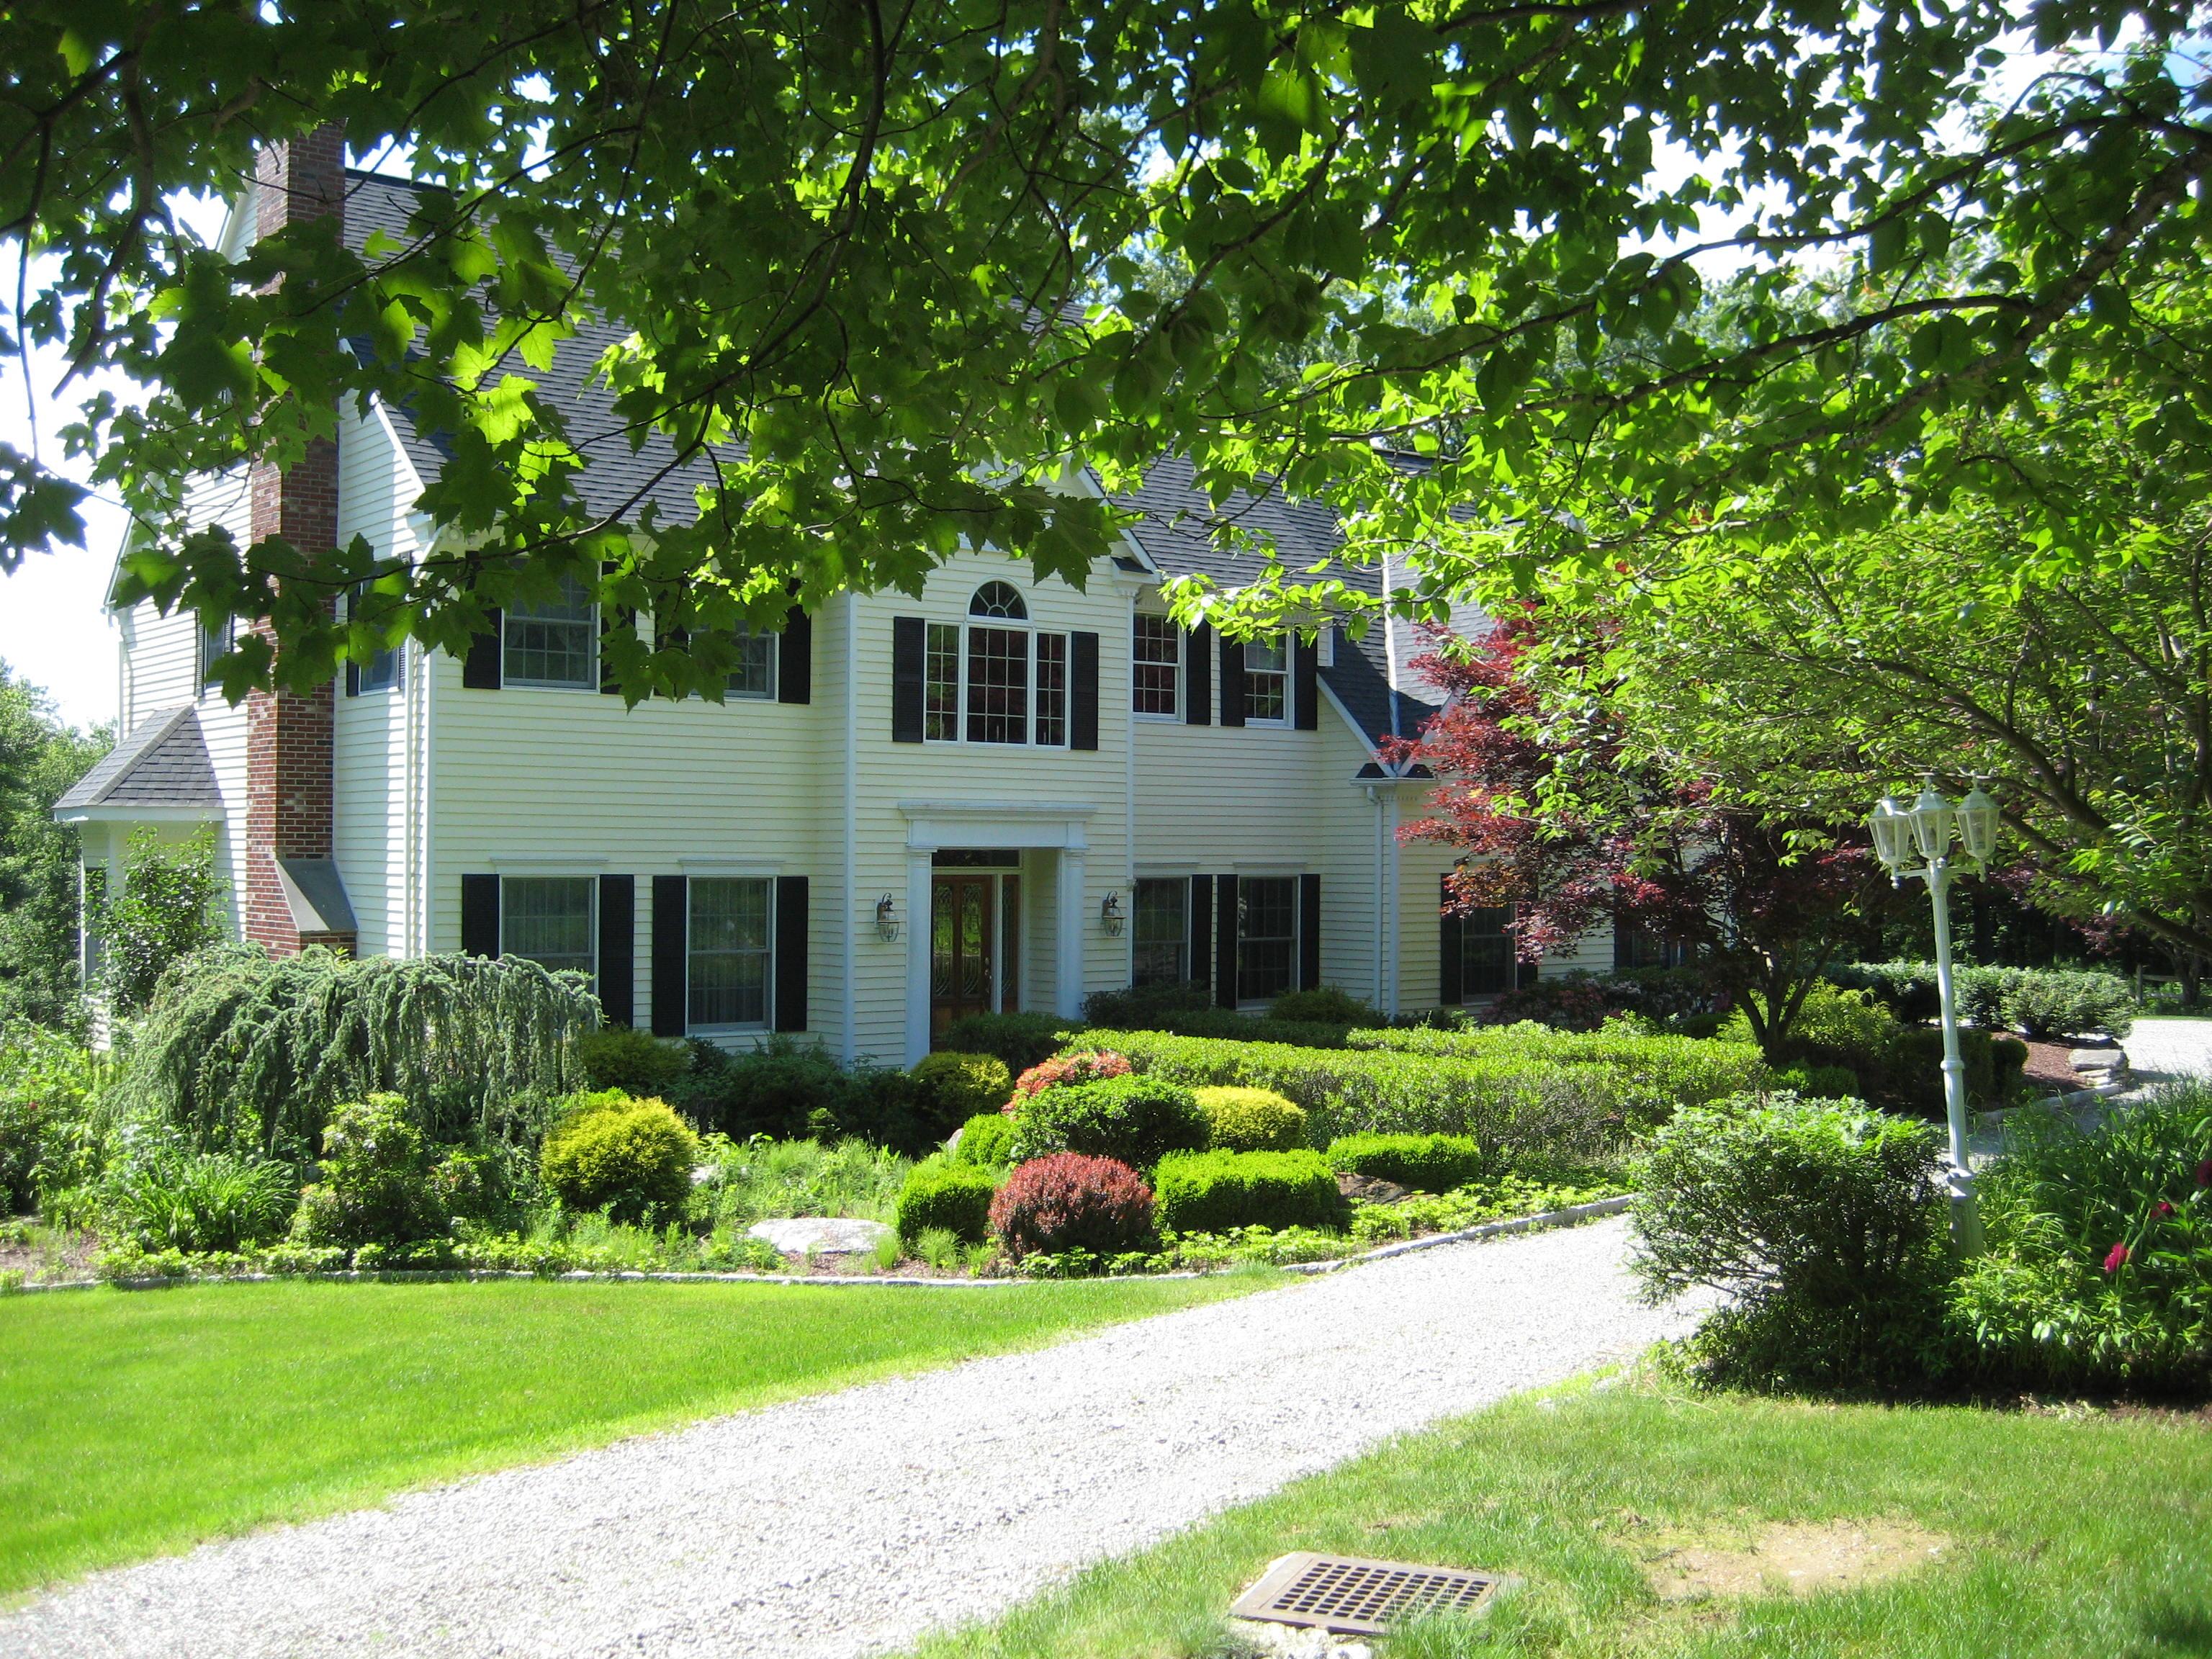 Casa Unifamiliar por un Venta en Beautiful Setting with Privacy 11 East Litchfield Road Litchfield, Connecticut 06759 Estados Unidos